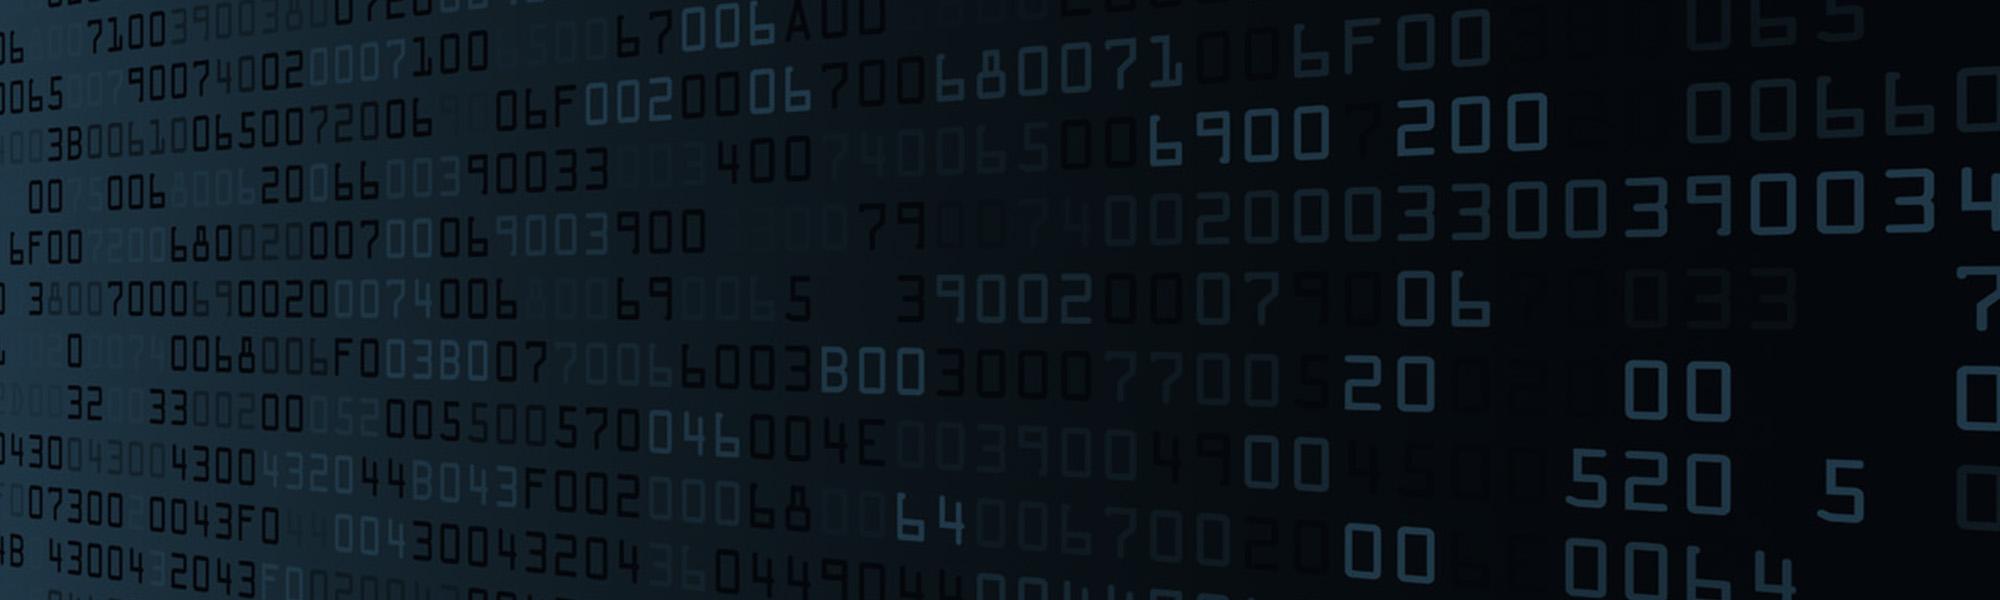 Silosmashers-Cyber-Security